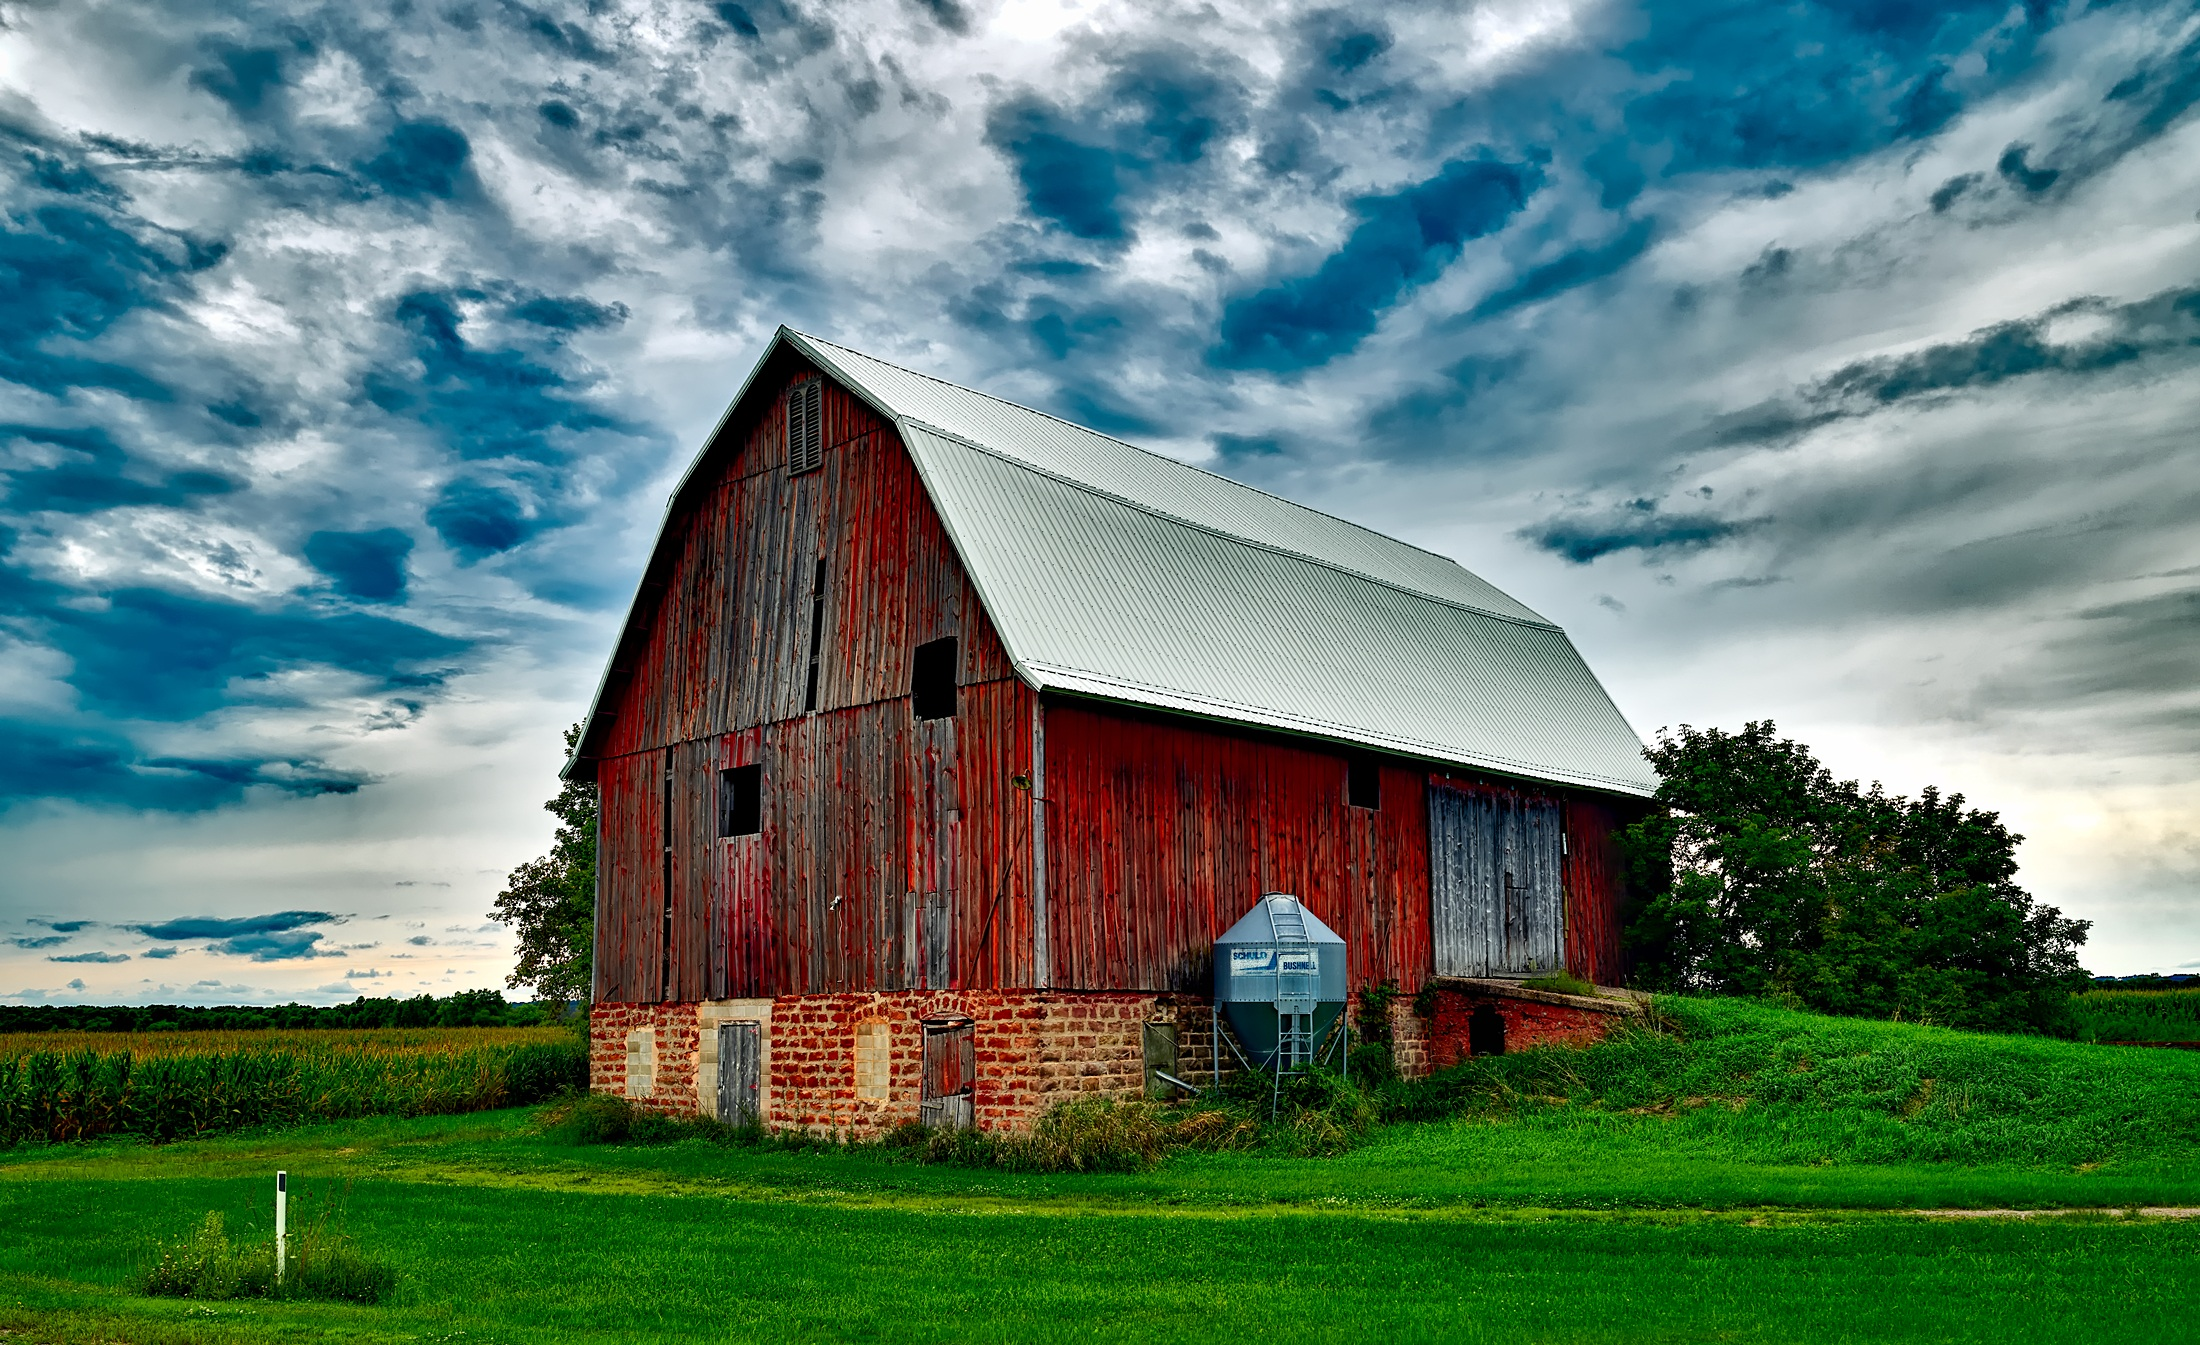 Barn On Field Against Sky 183 Free Stock Photo